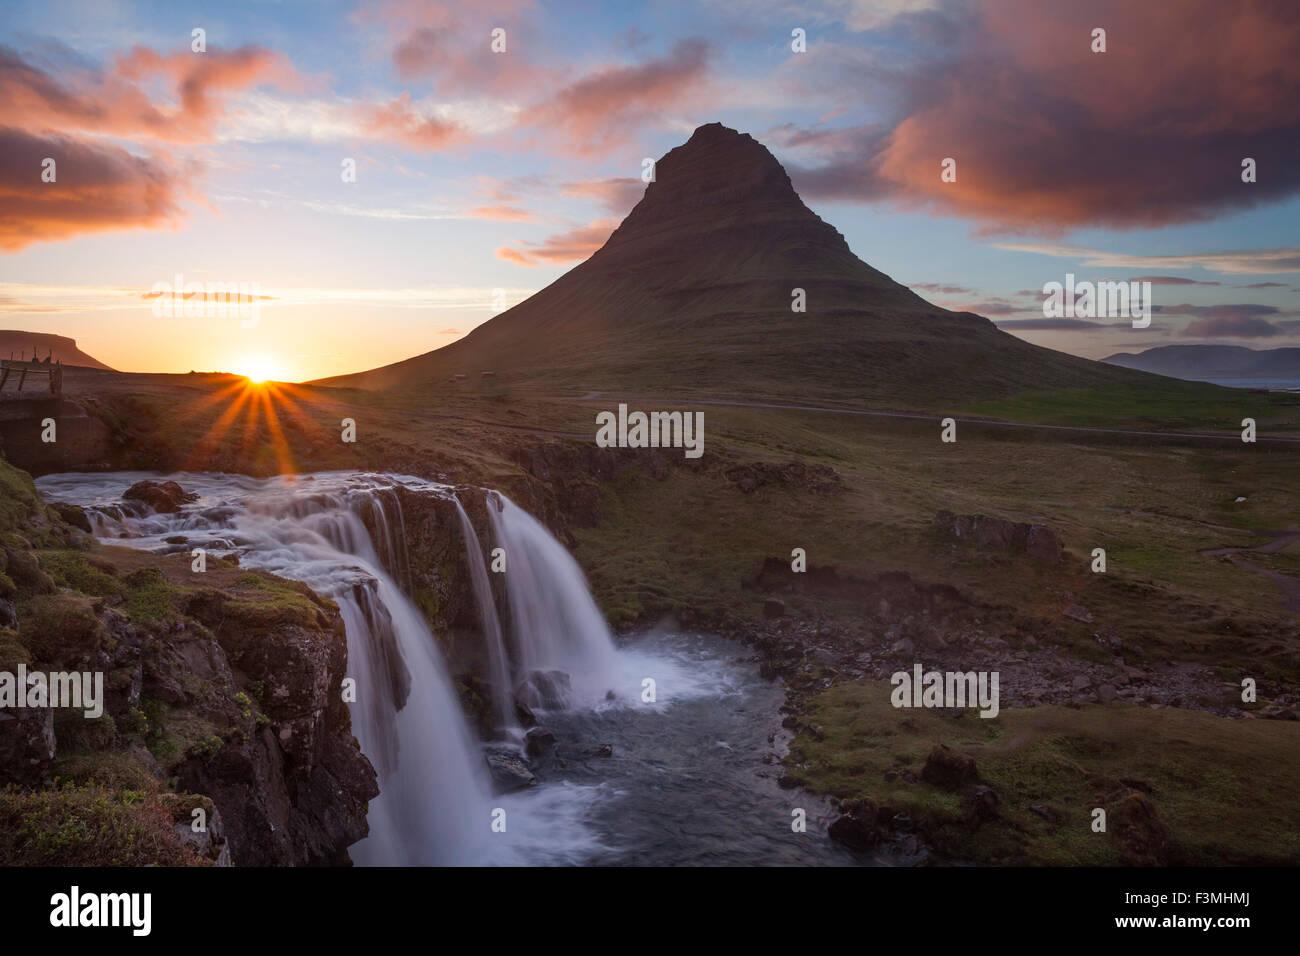 Sonnenuntergang über Kirkjufell Berg und Wasserfall, Grundarfjordur, Snaefellsnes Halbinsel, Vesturland, Island. Stockbild